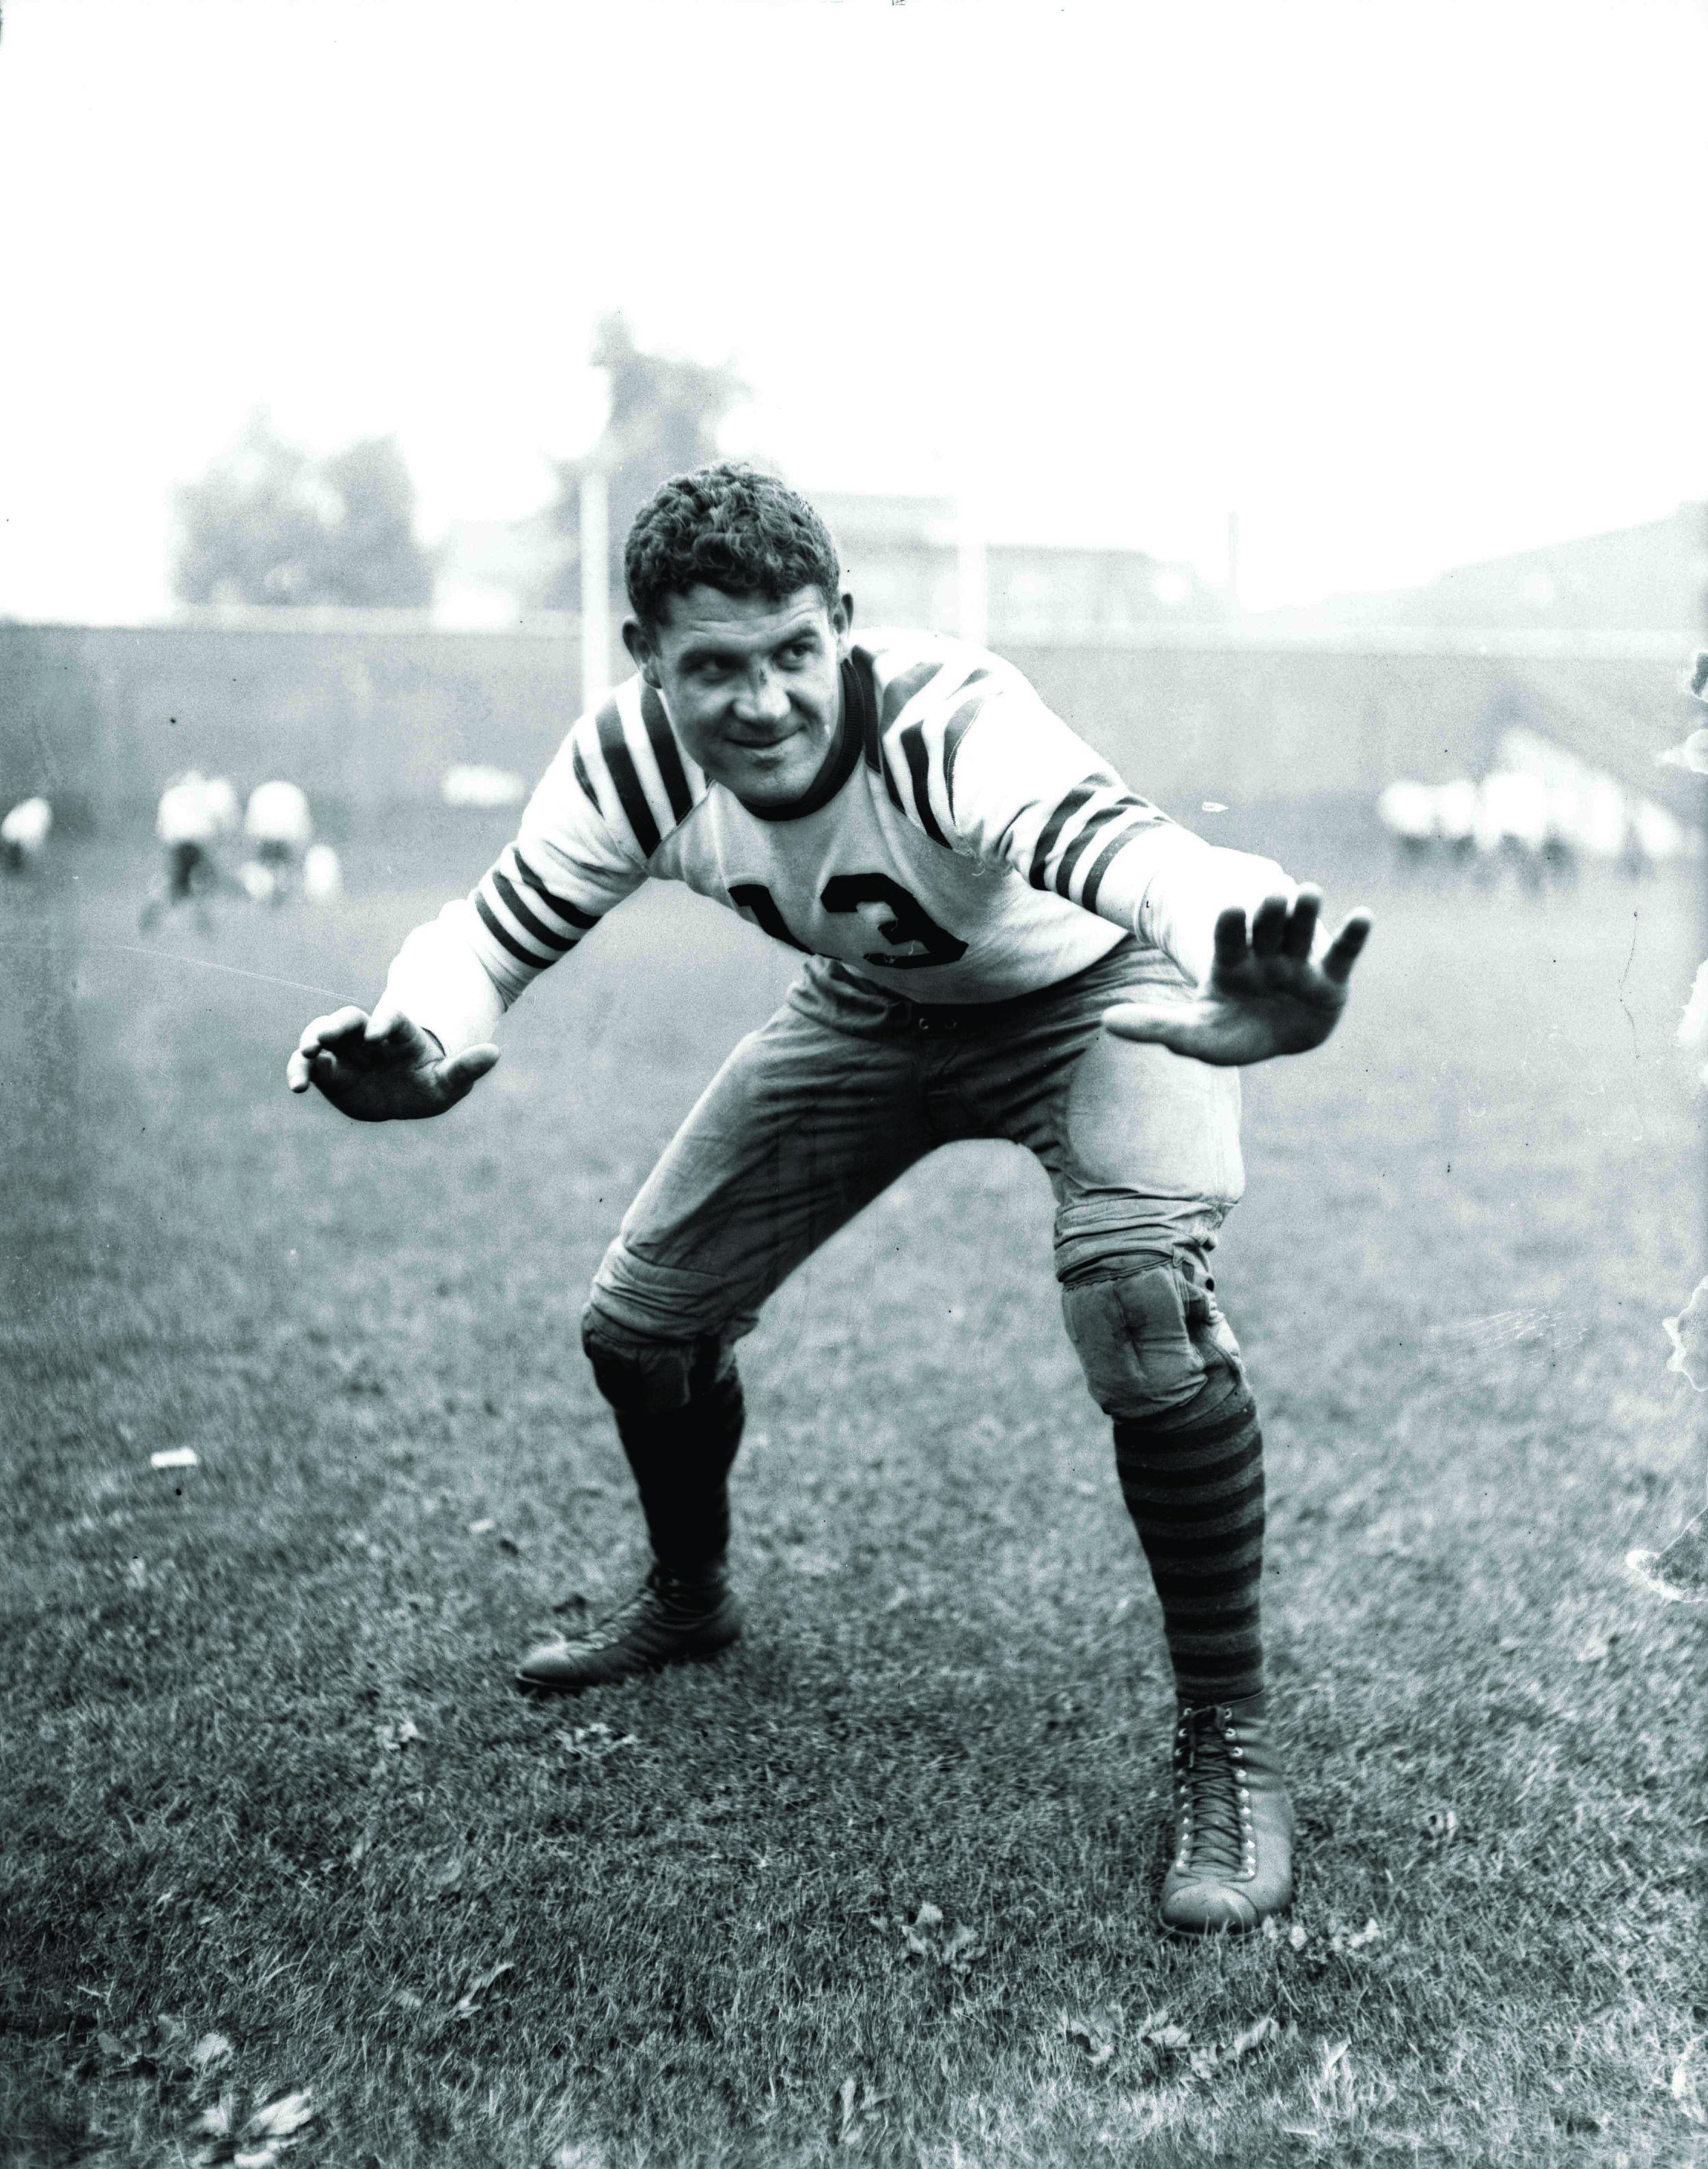 Joe Stydahar's football career was interrupted by a stint in the U.S. Navy during World War II.